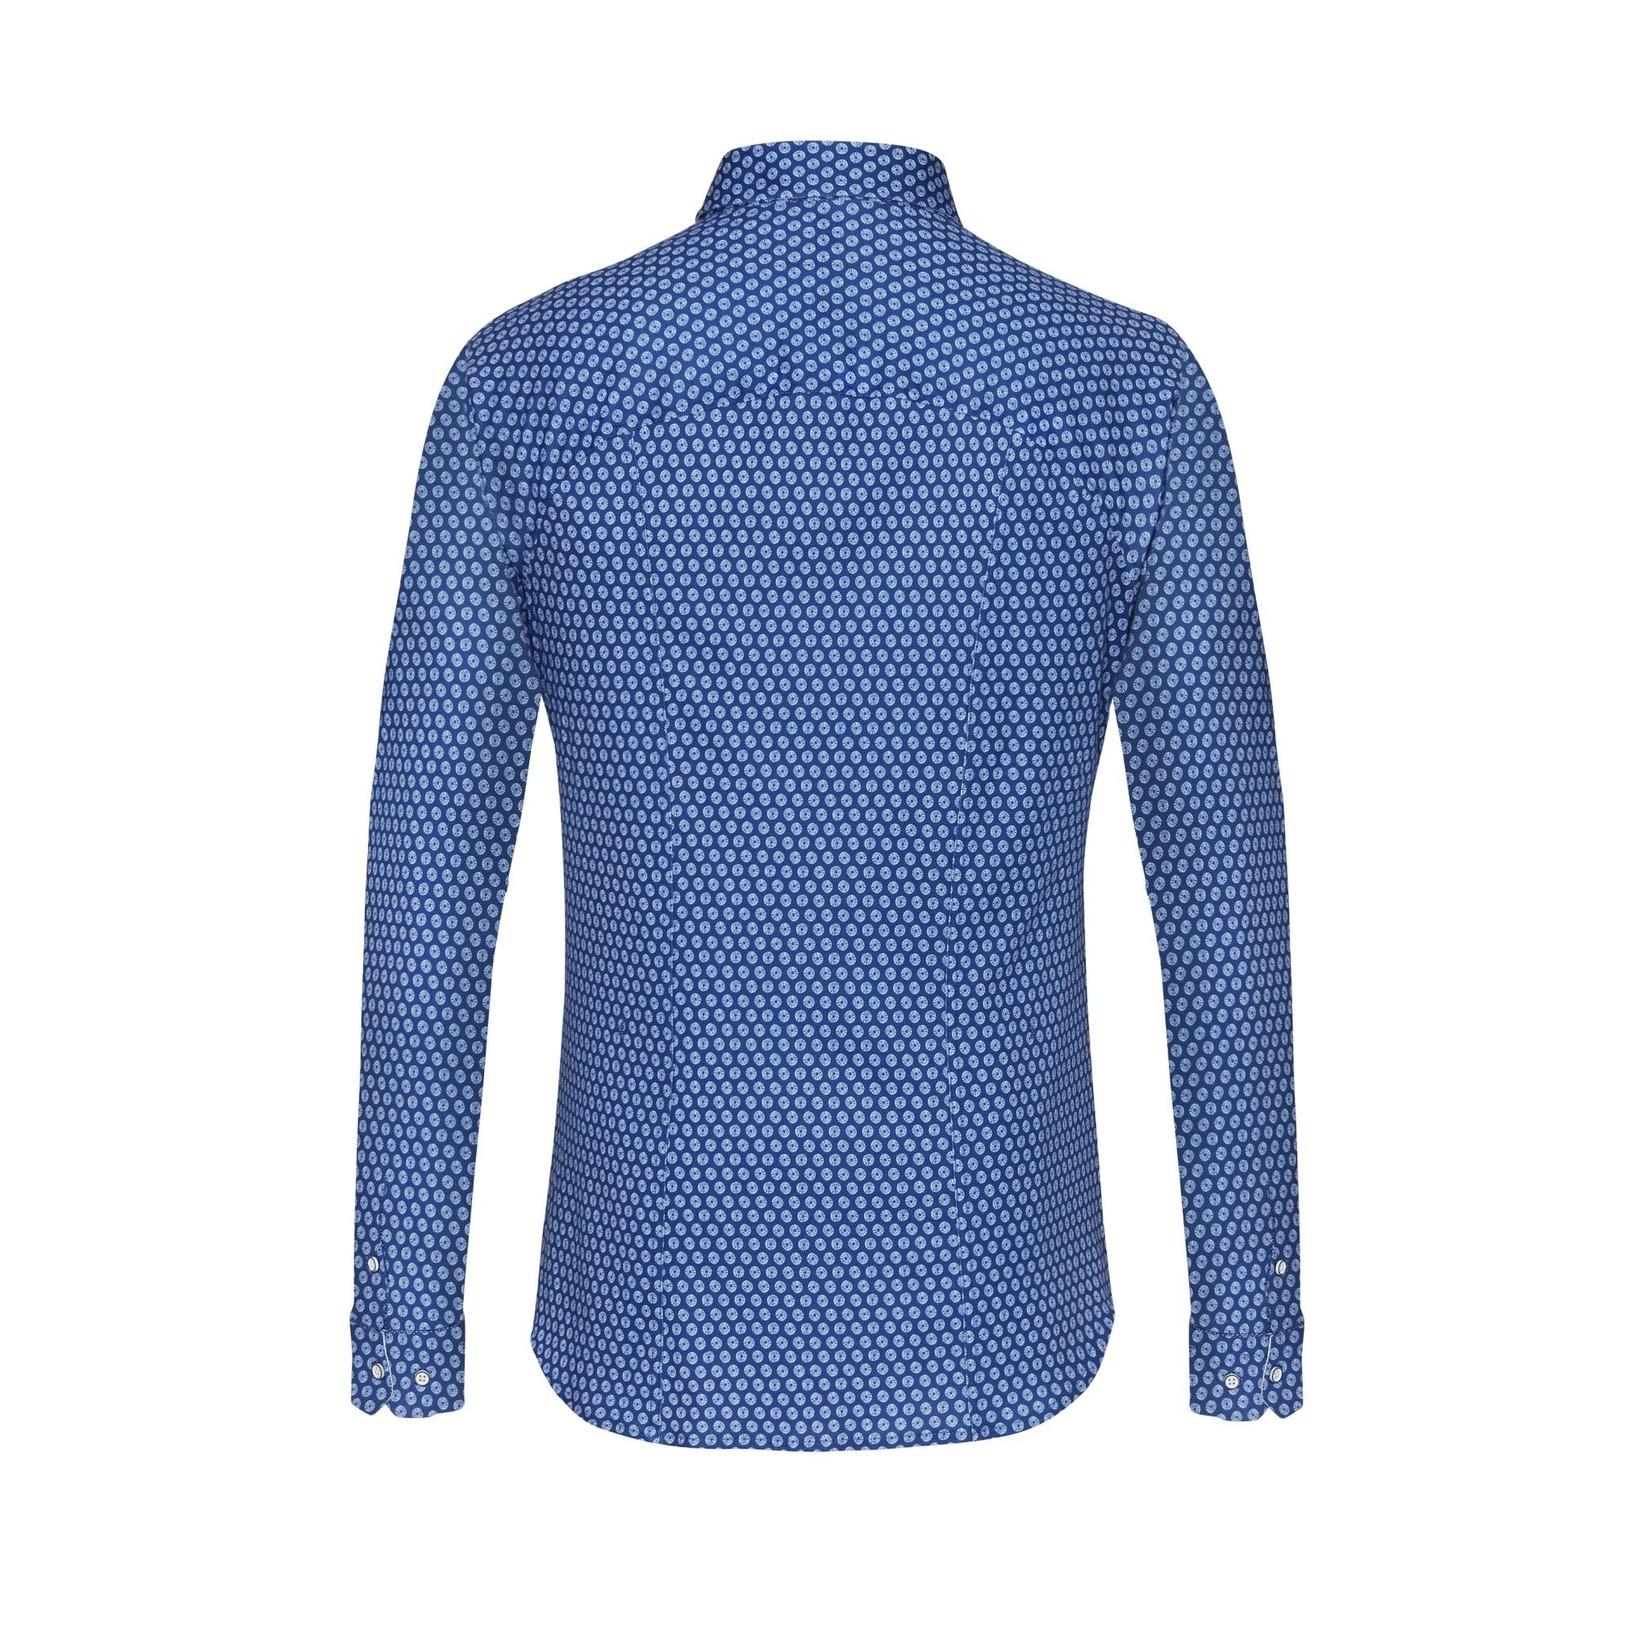 Desoto jersey overhemd cobalt blauw print